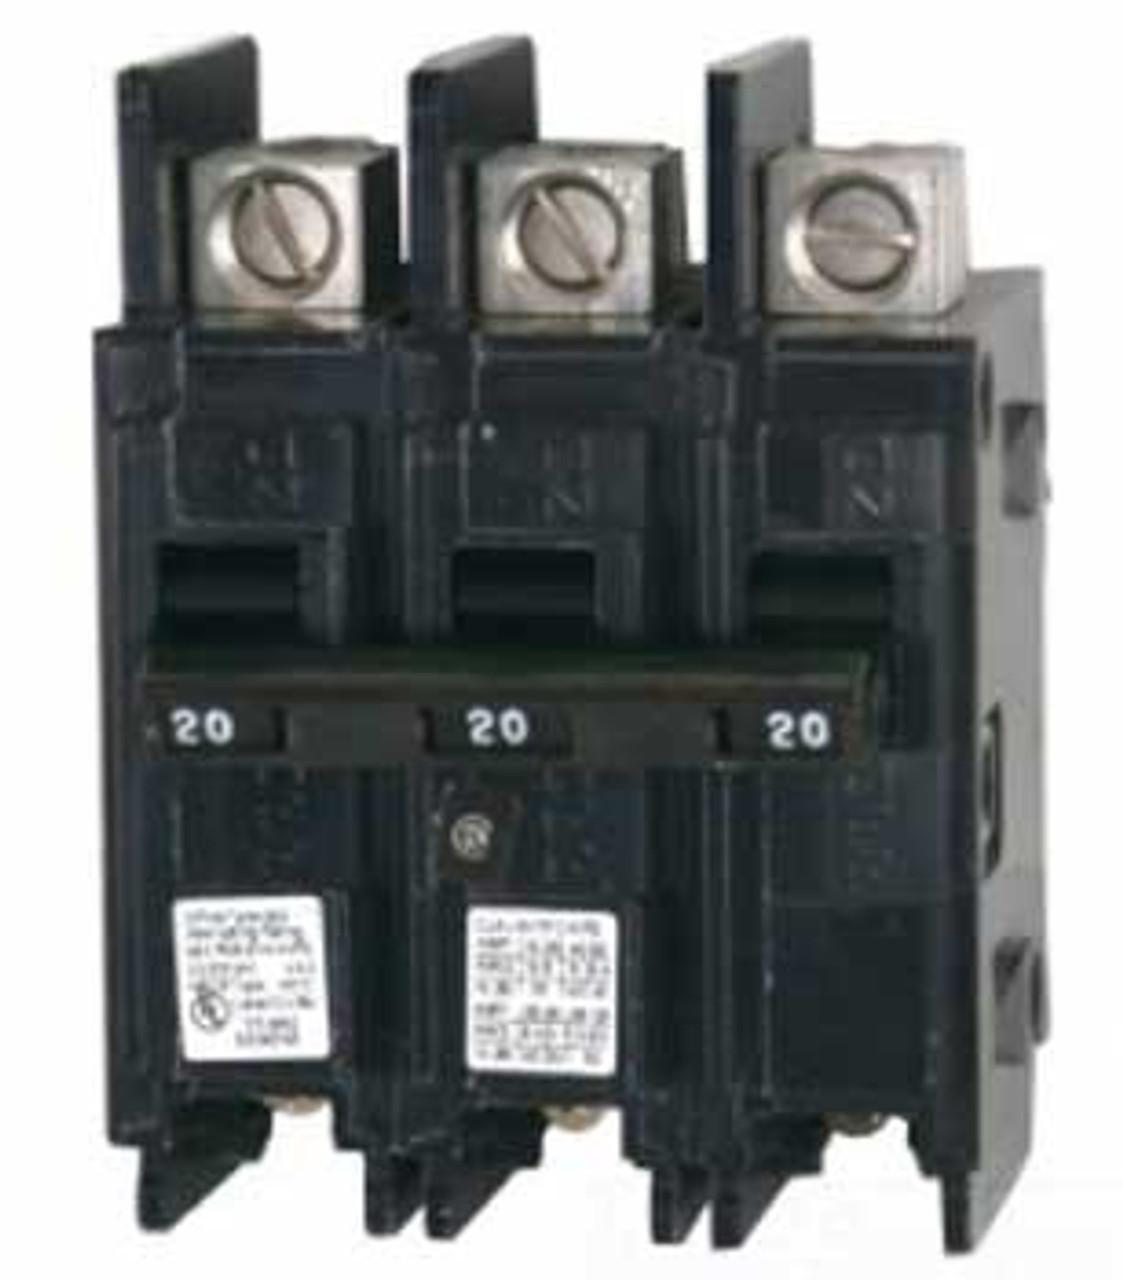 Siemens BQ3B025 3 Pole 25 Amp 240VAC MC Circuit Breaker - Used